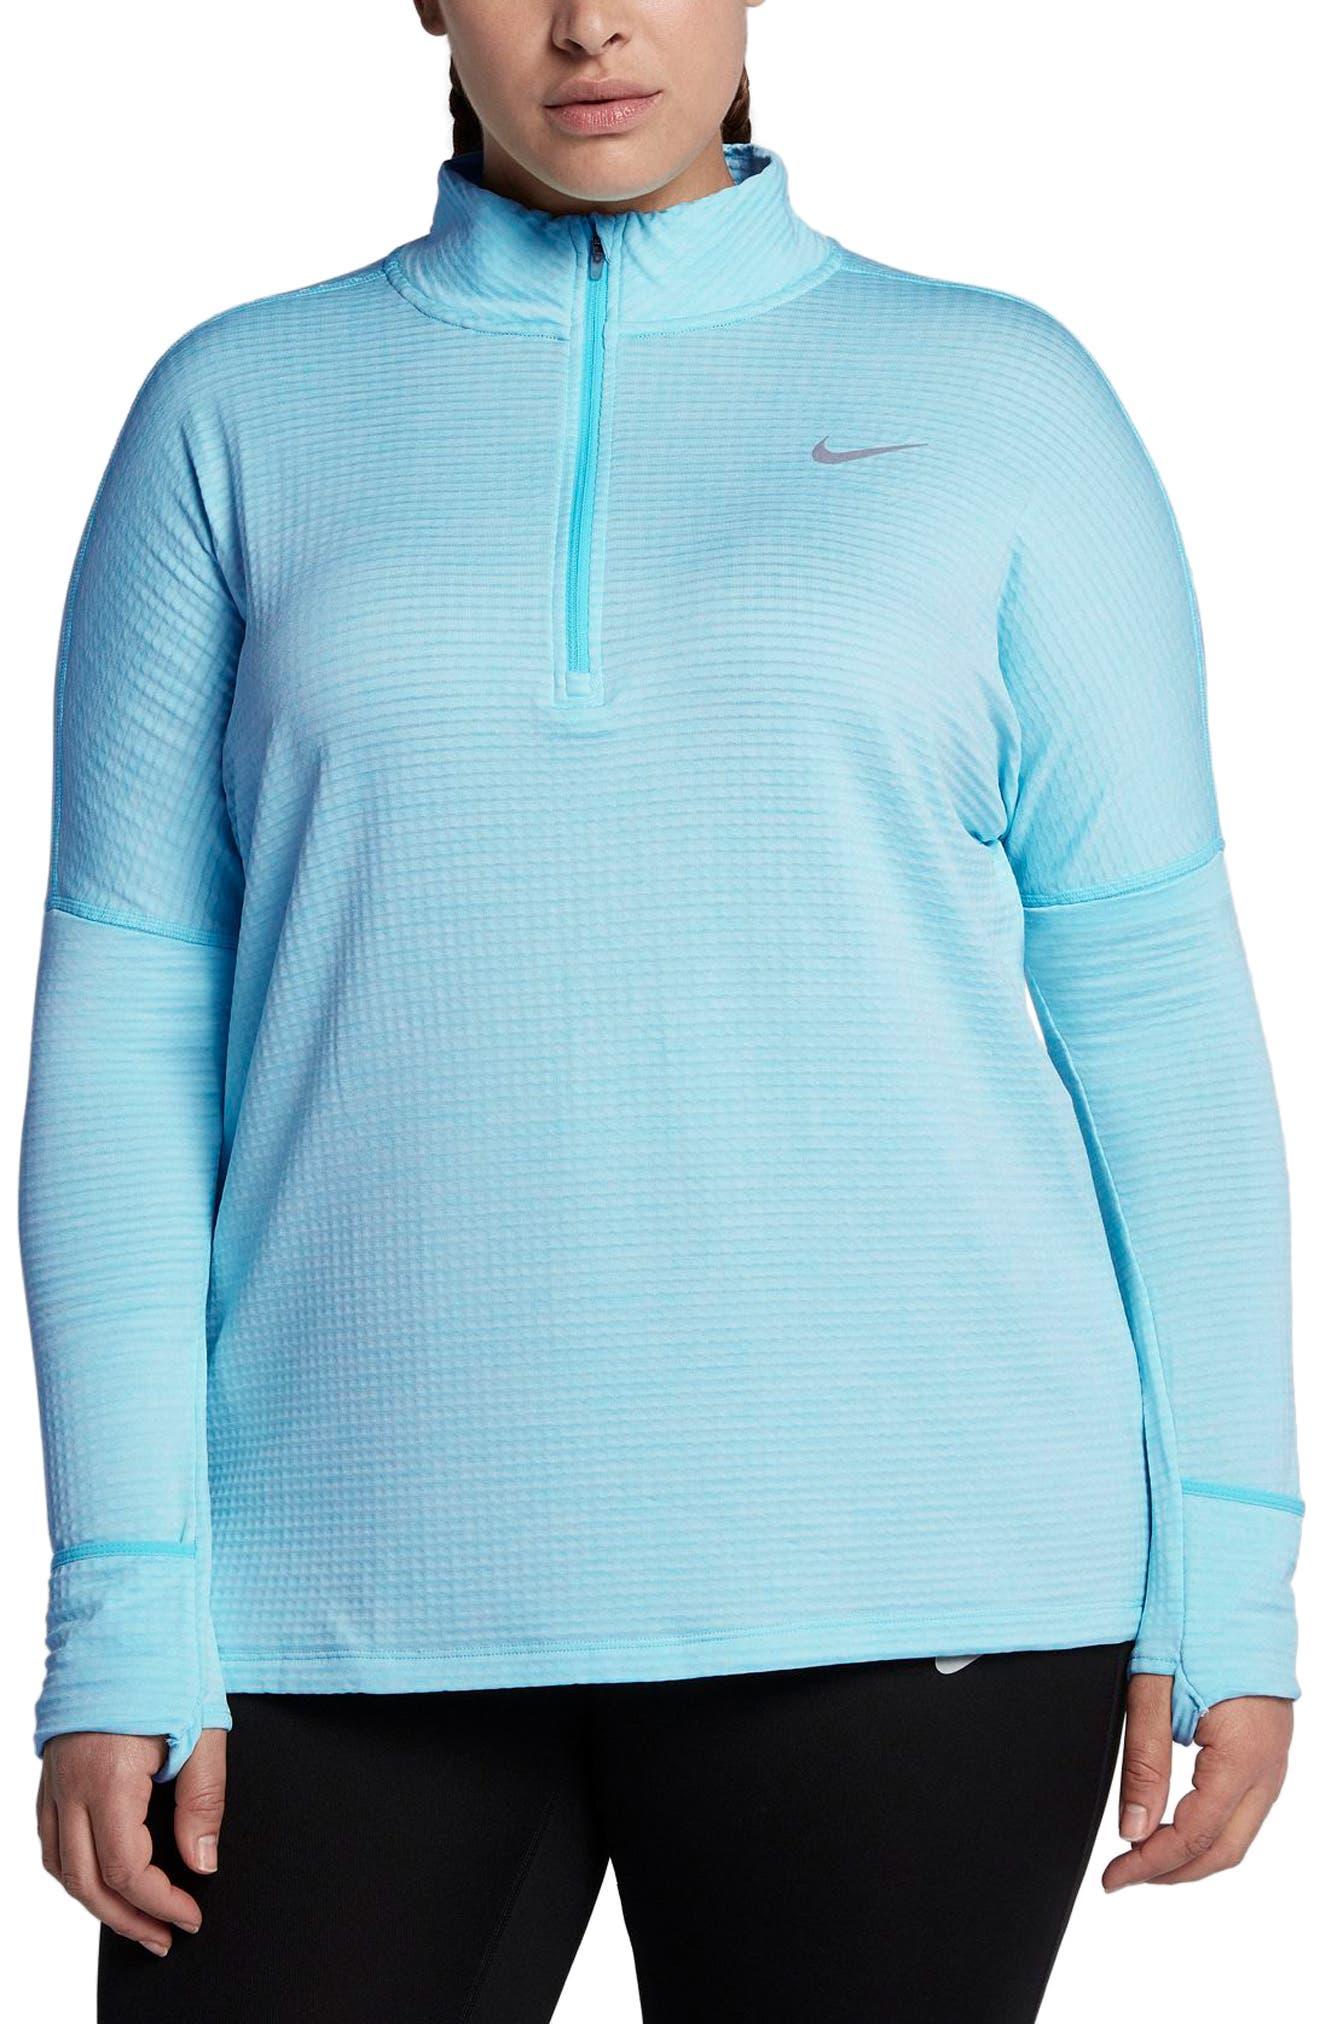 Main Image - Nike Sphere Element Long Sleeve Running Top (Plus Size)